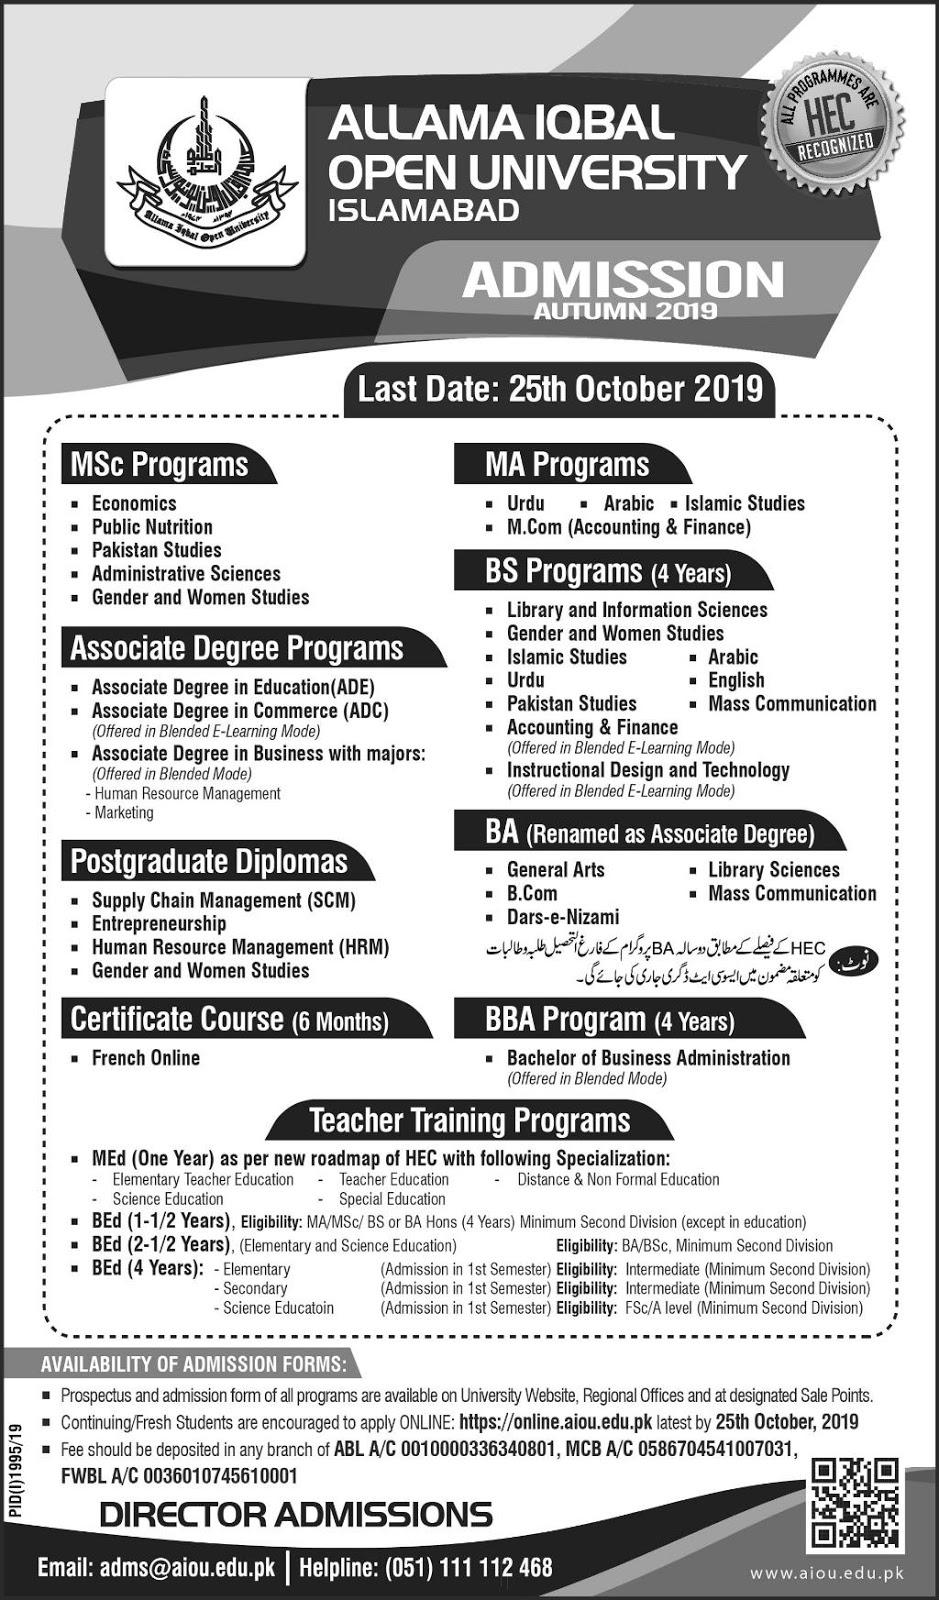 Allama Iqbal Open University Autumn Admission last date